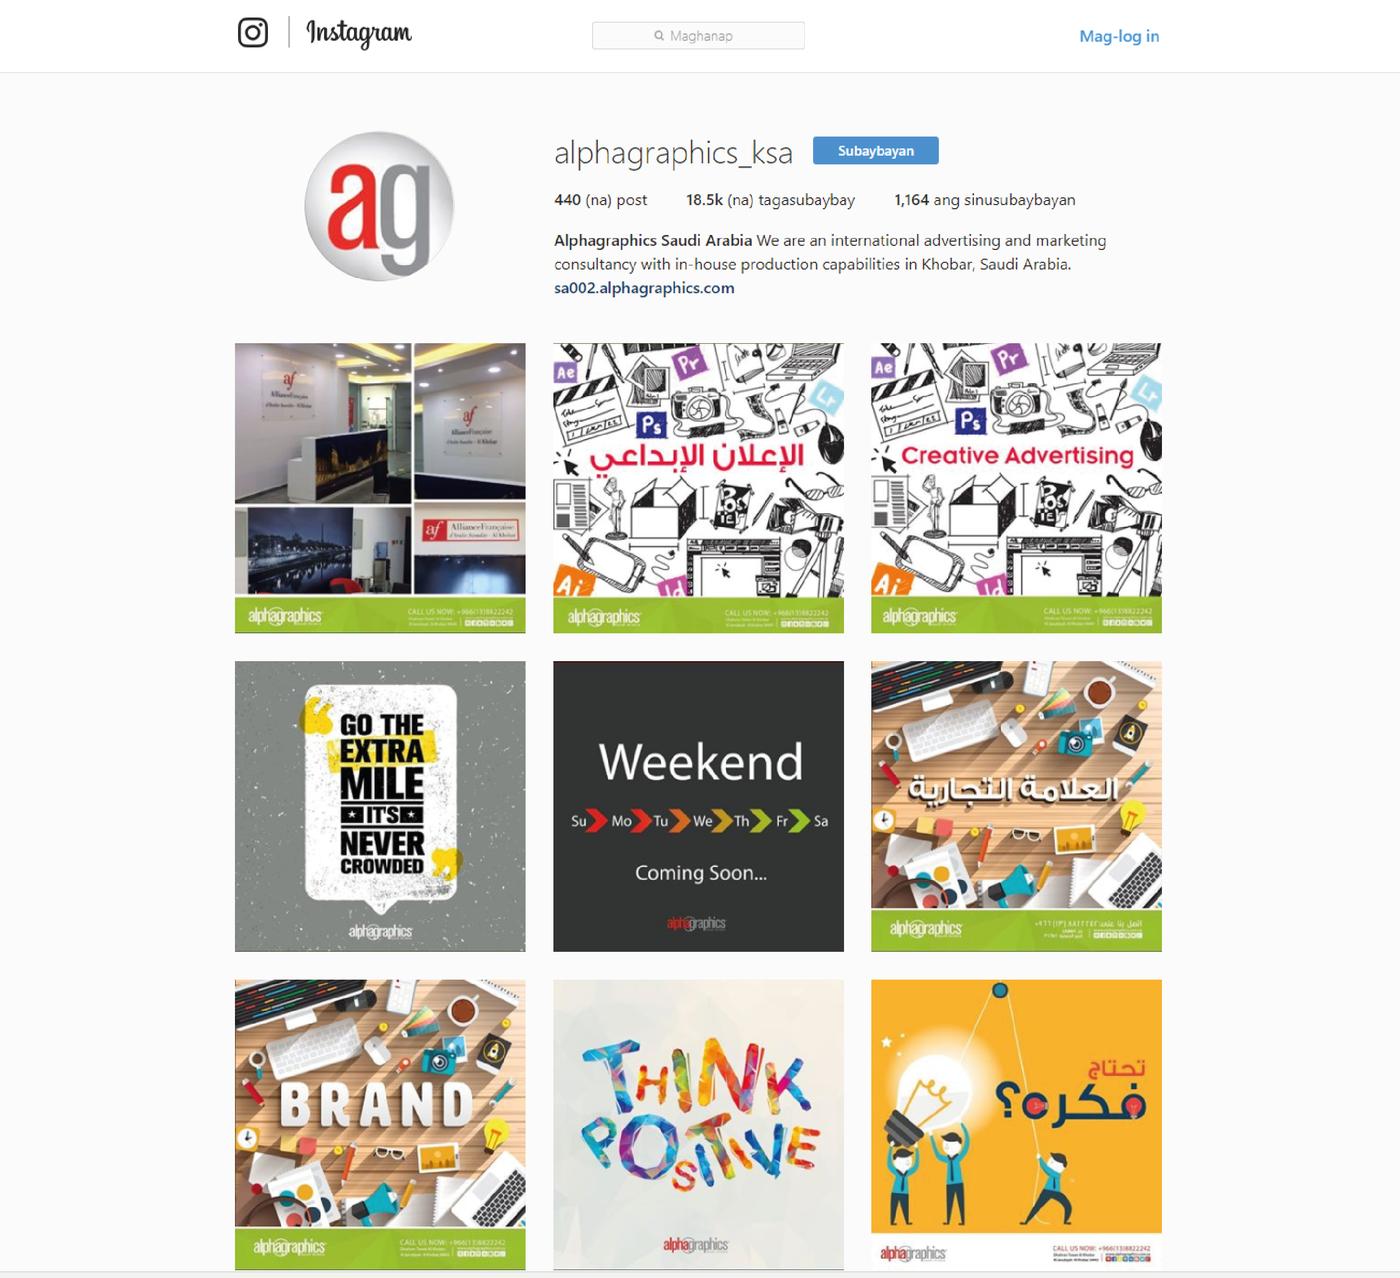 Social Media design samples by Soomayah Alshowikhat at Coroflot com